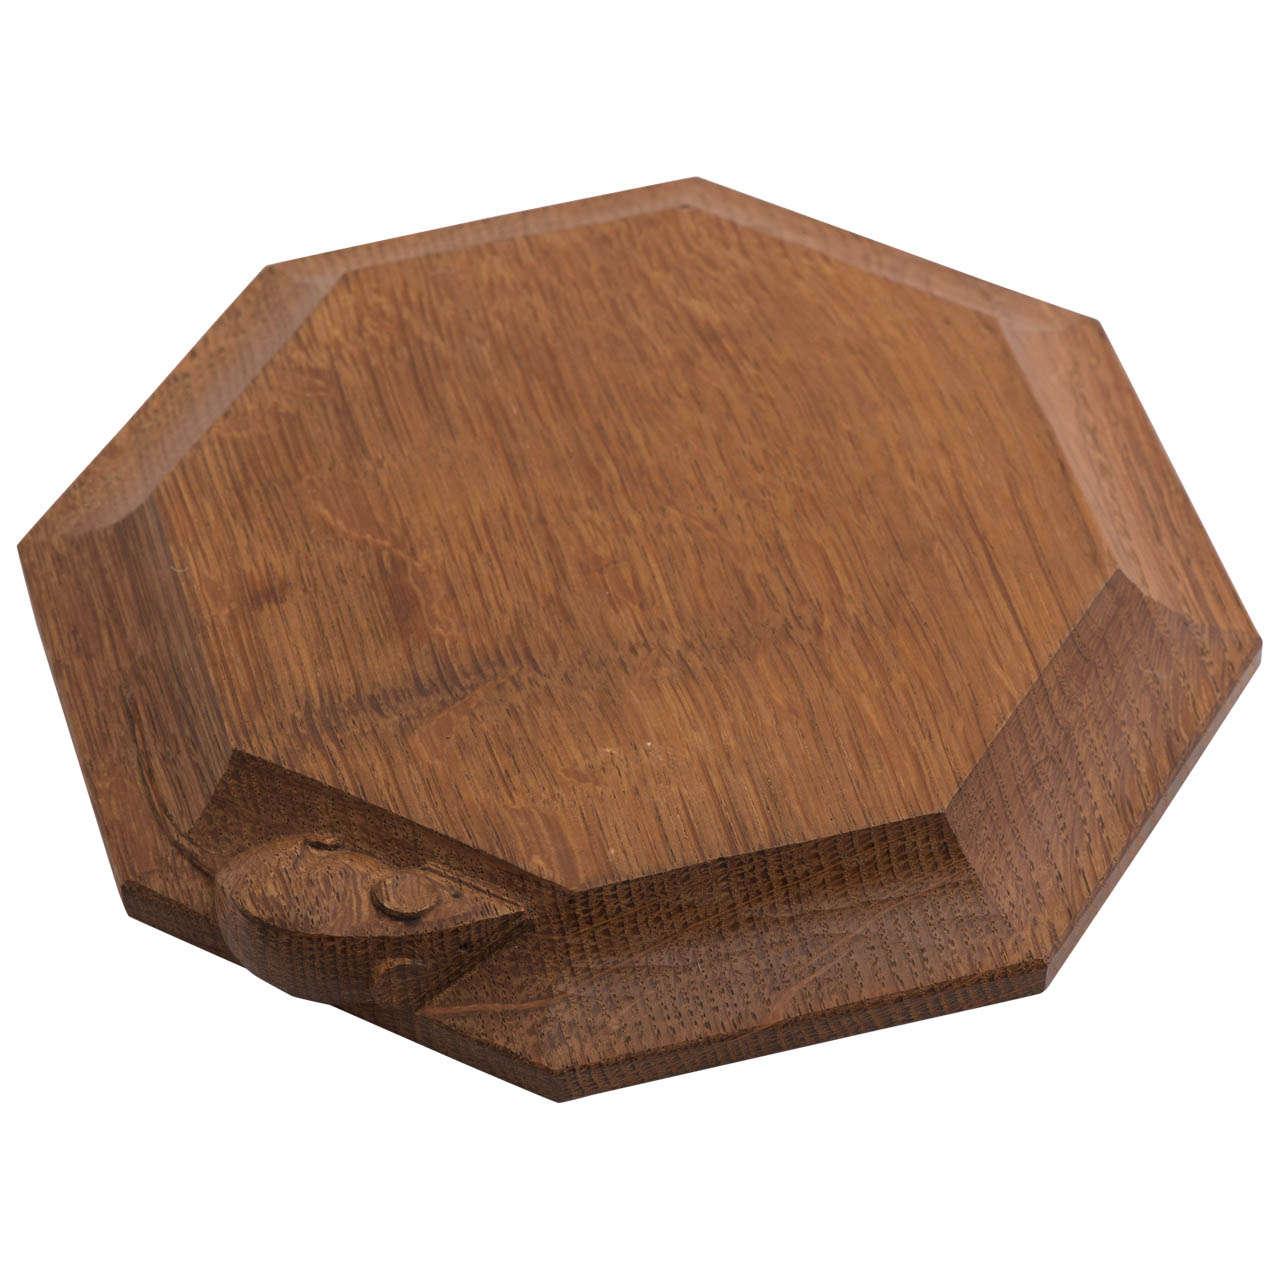 Robert Mouseman Thompson octagonal oak cheese board, England circa 1970